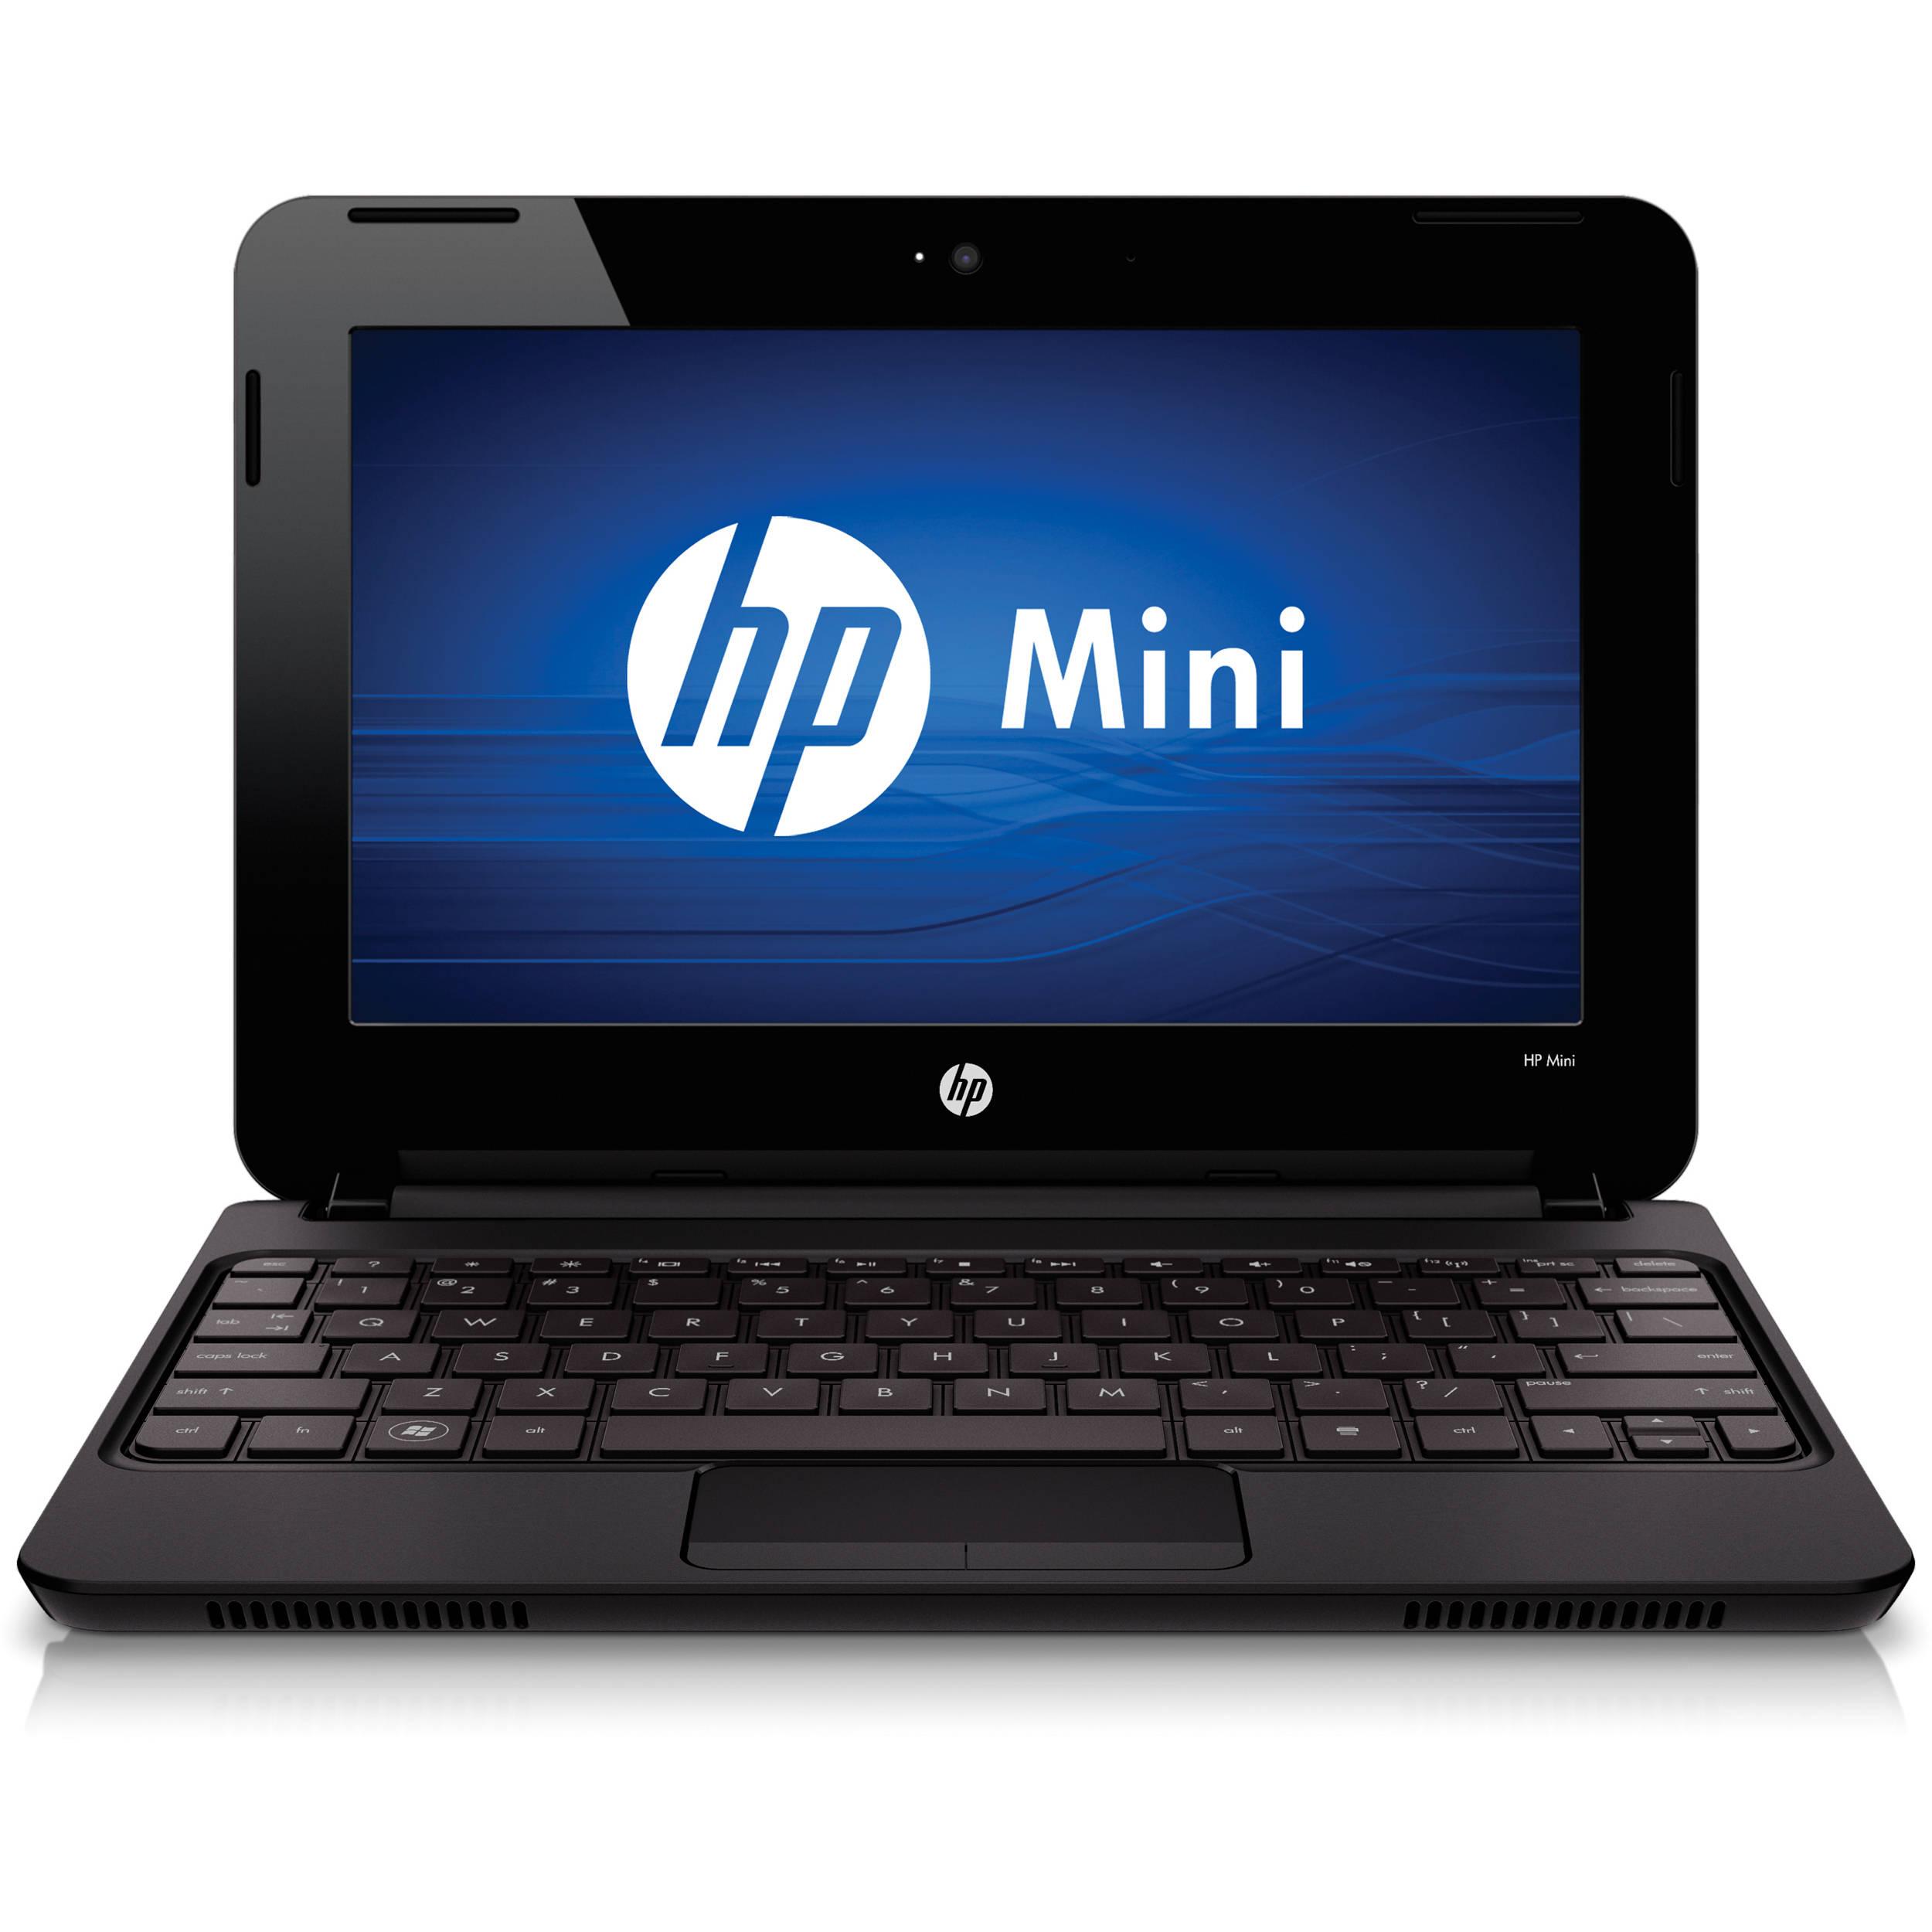 HP Mini 110-3030nr Notebook Qualcomm Mobile Broadband Driver UPDATE